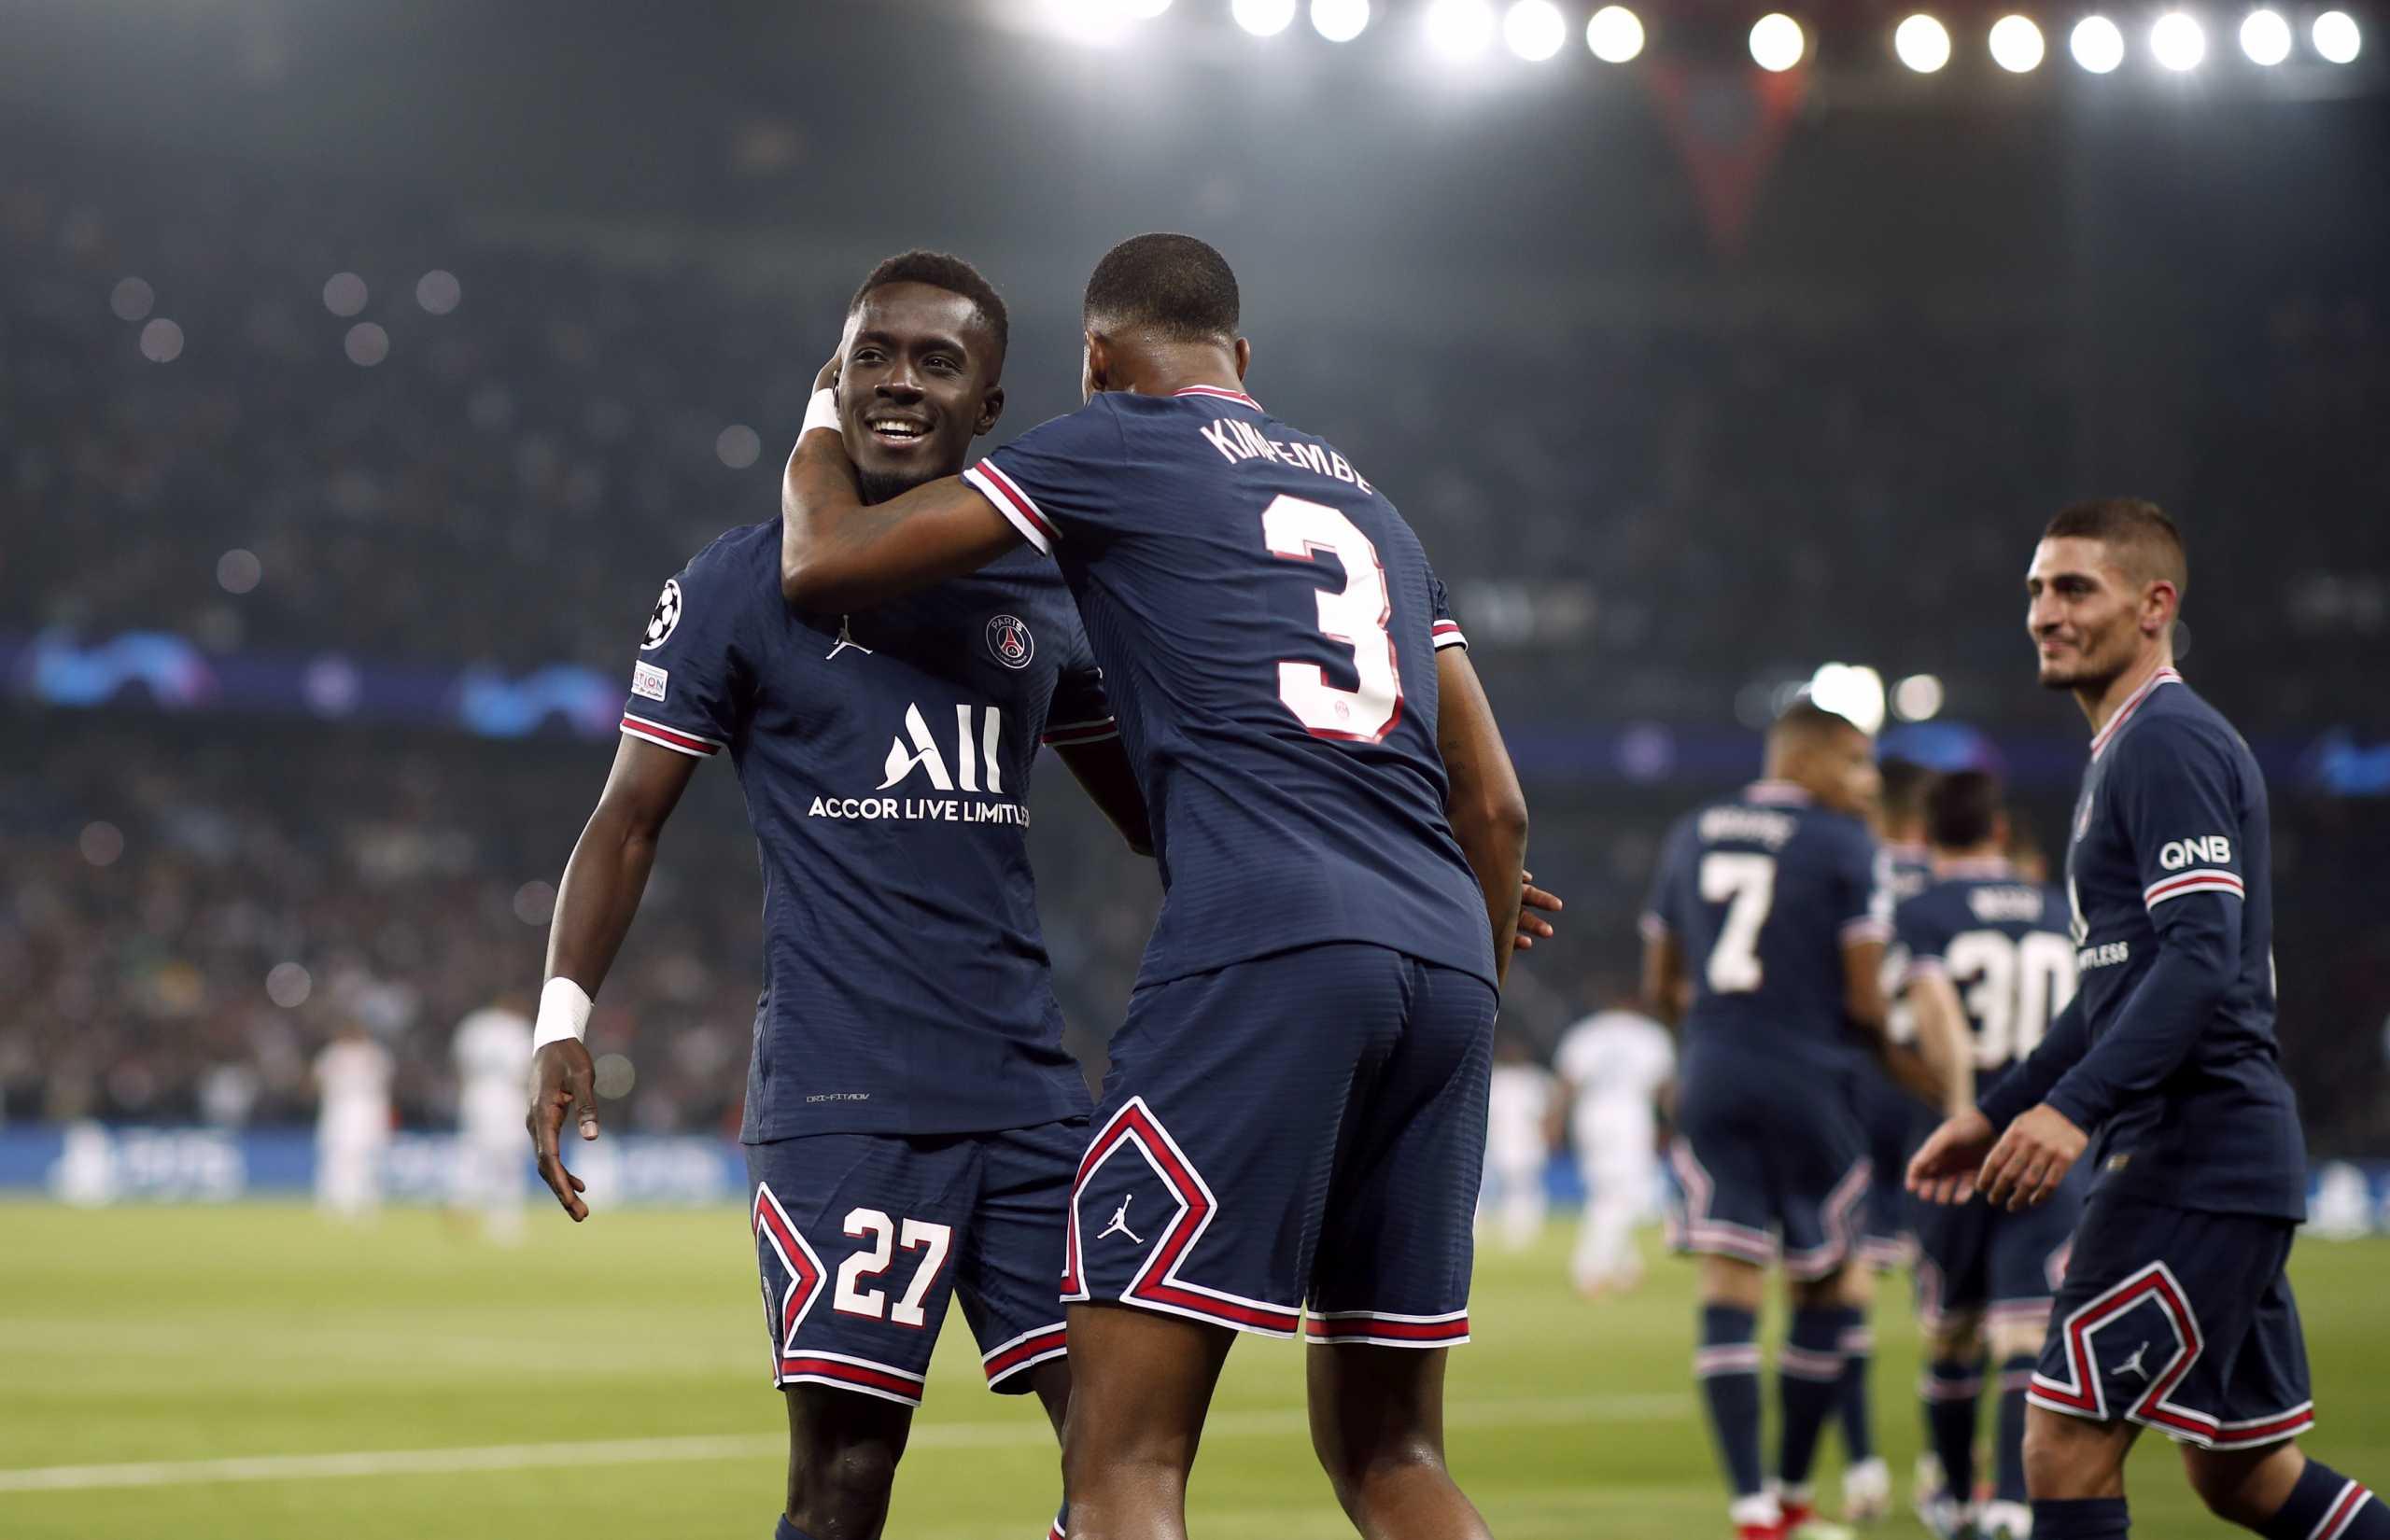 Champions League LIVE τα ματς της πρώτης ημέρας της 2ης αγωνιστικής